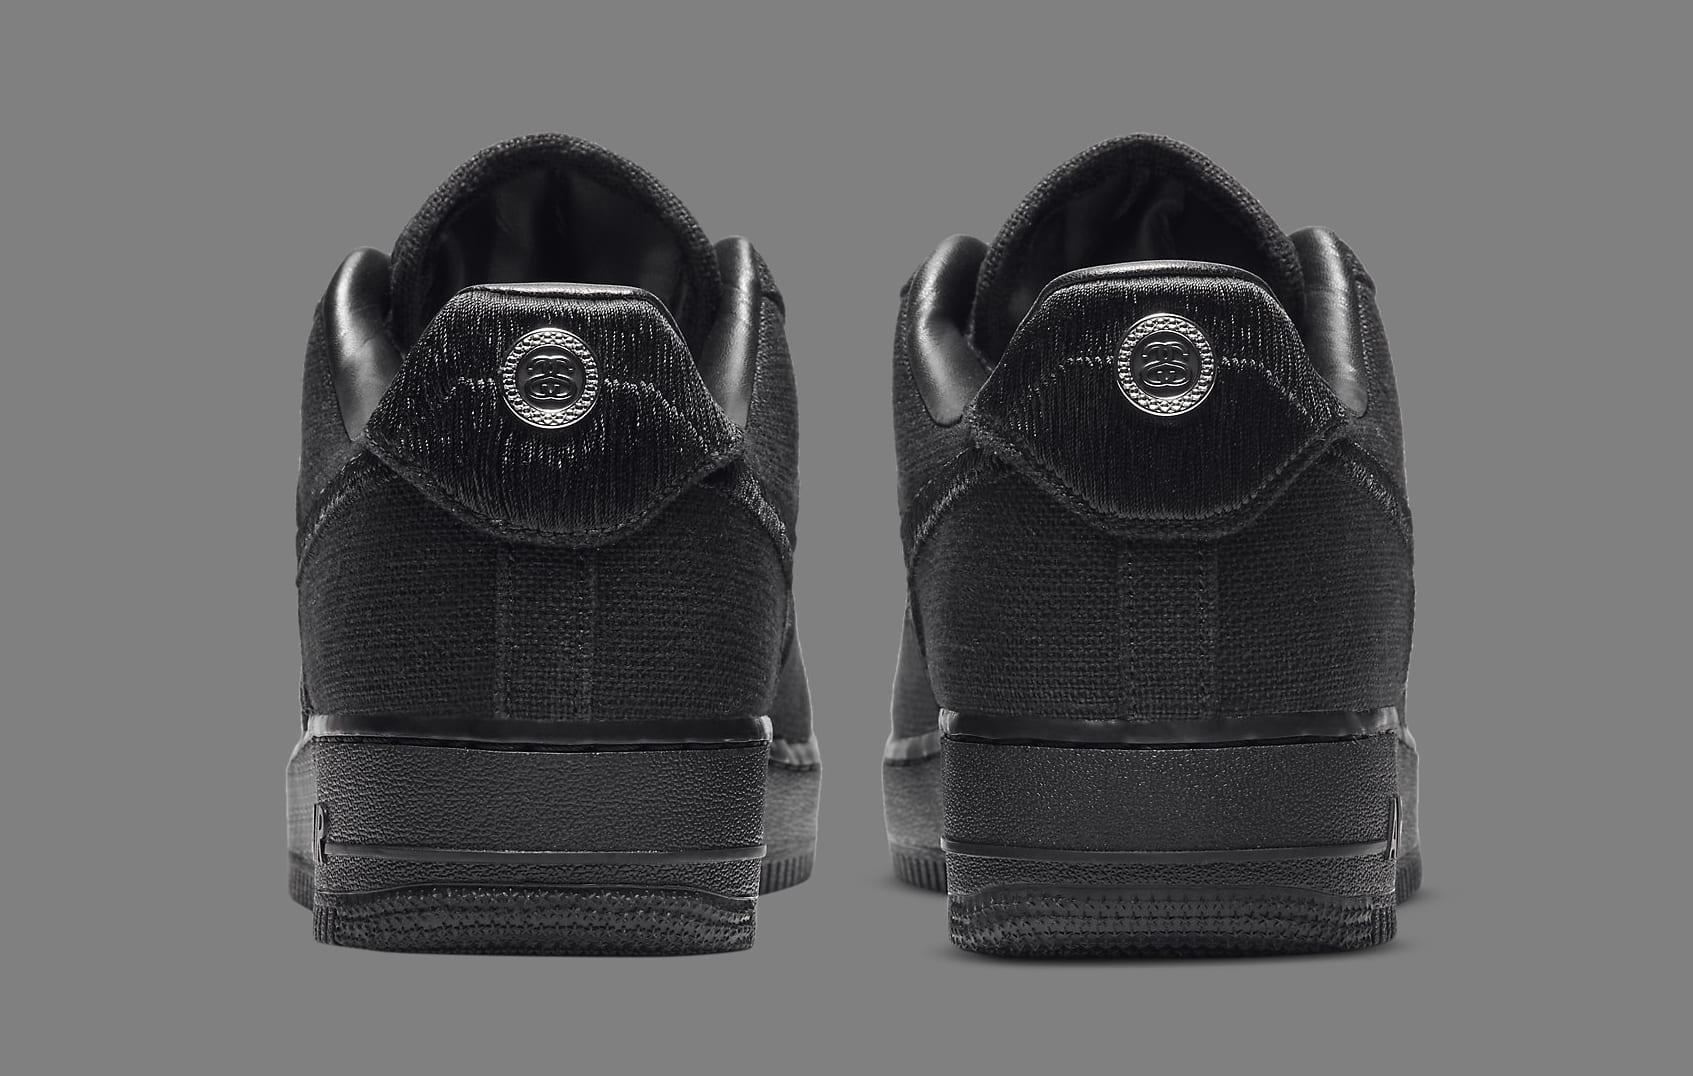 Stussy x Nike Air Force 1 Low 'Black' CZ9084-001 Heel